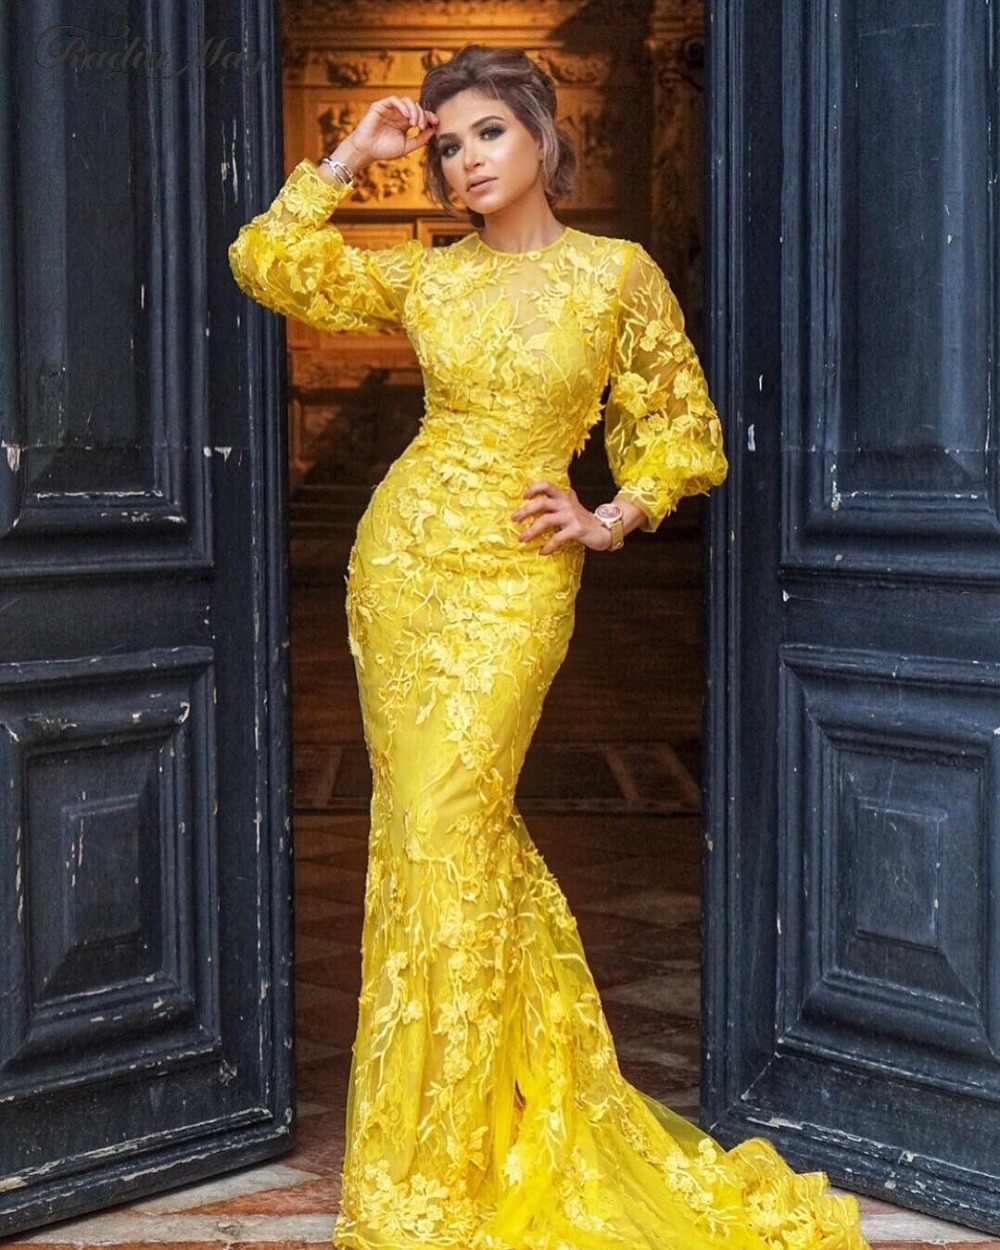 0803d7e5b8 2019 Gold Yellow Lace Long Sleeve Dubai Evening Dress Mermaid 3D Flora  Arabic Celebrity Prom Dresses